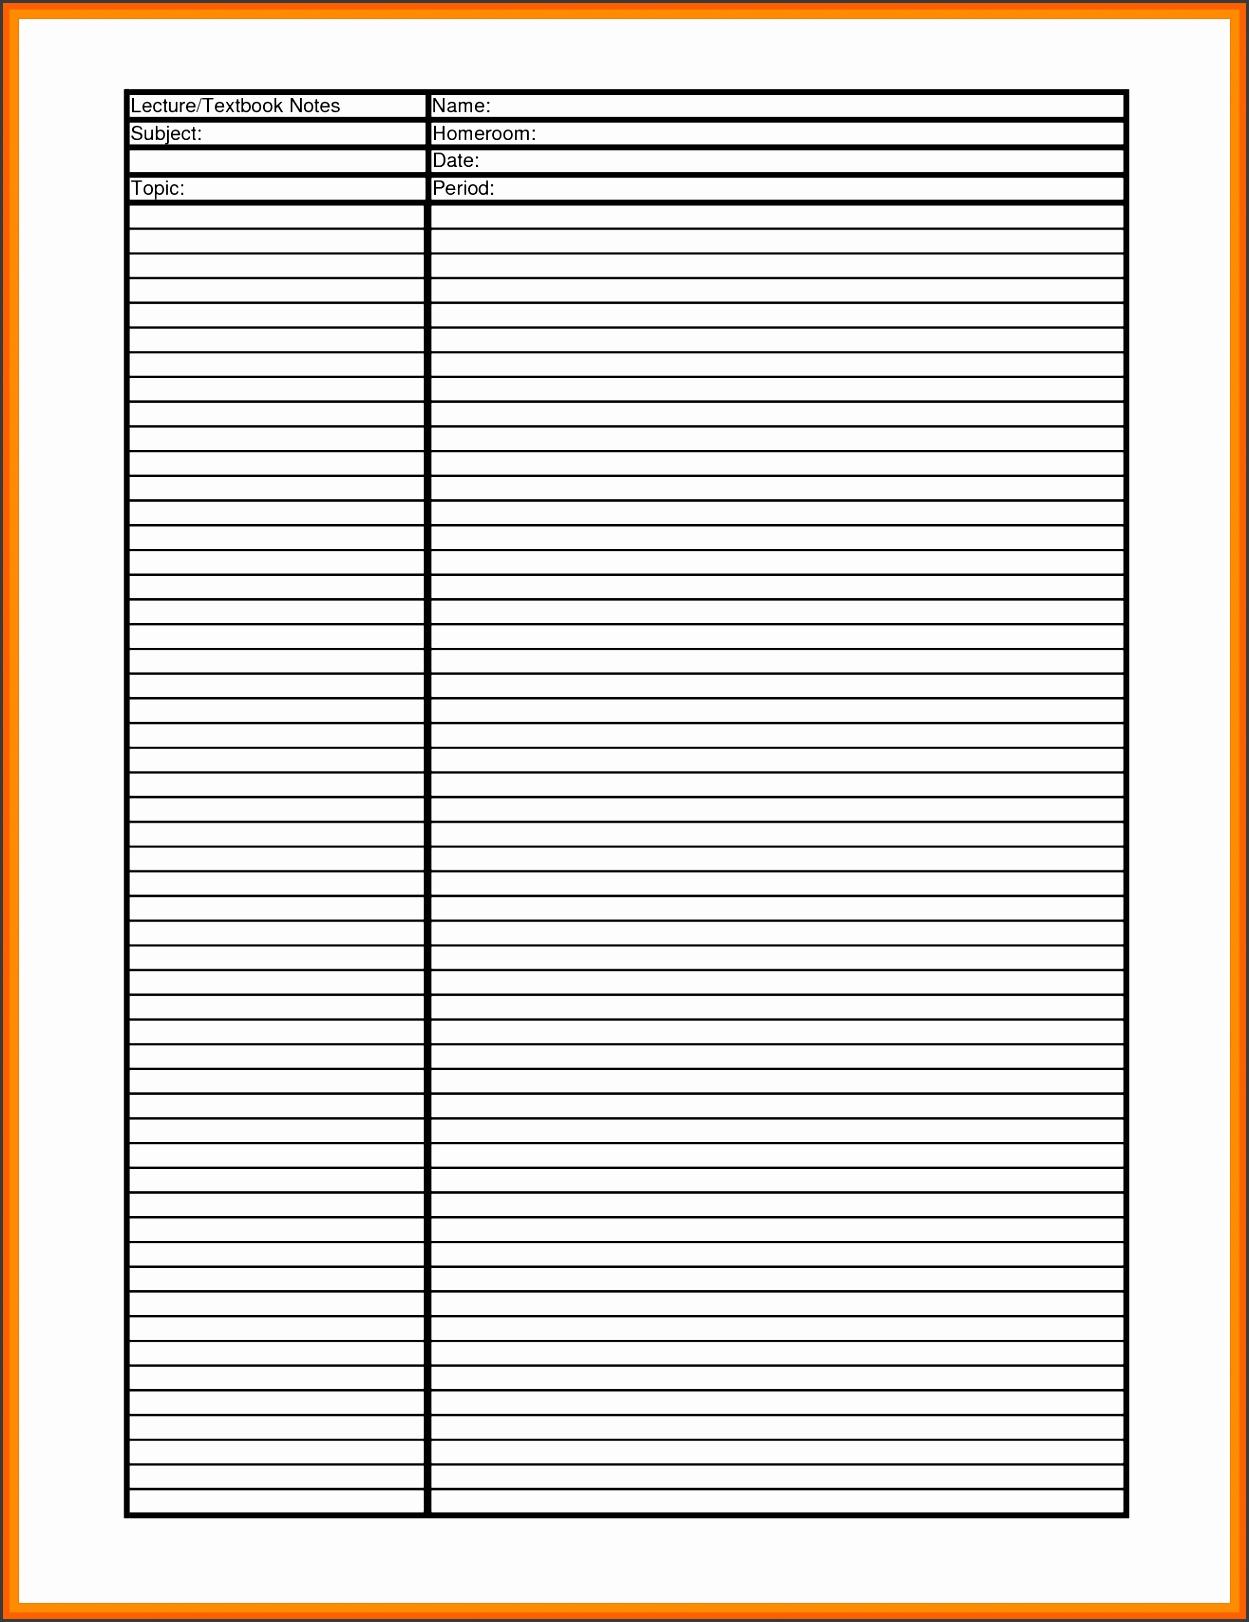 cornell notes pdf cornell notes template pdf cornell